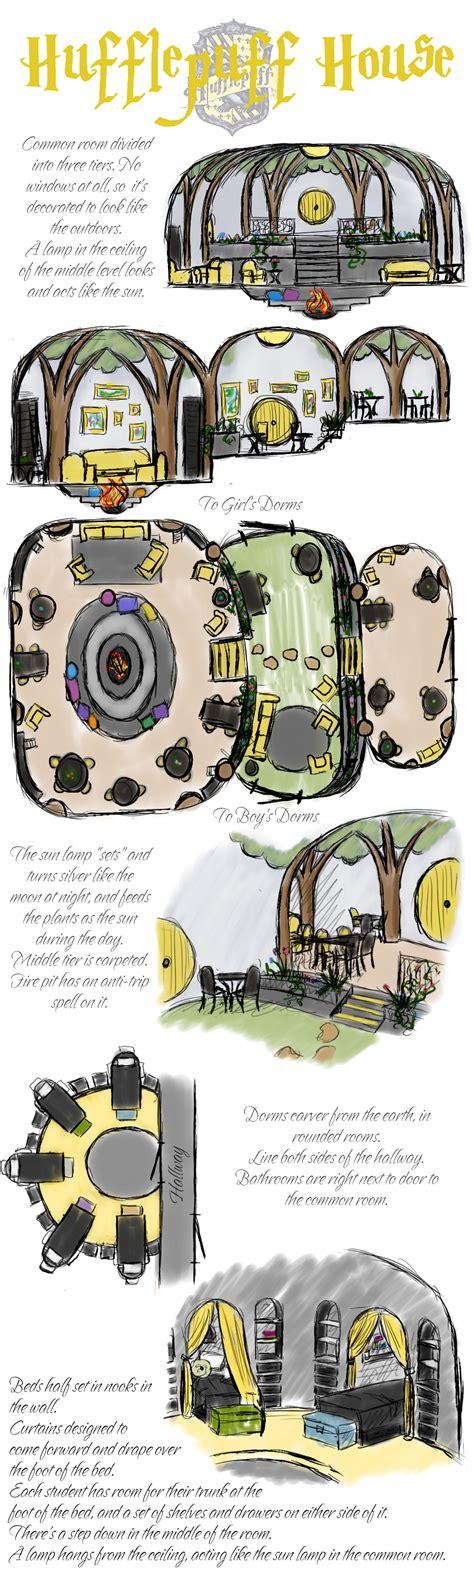 hufflepuff house hufflepuff house by whisperwings on deviantart